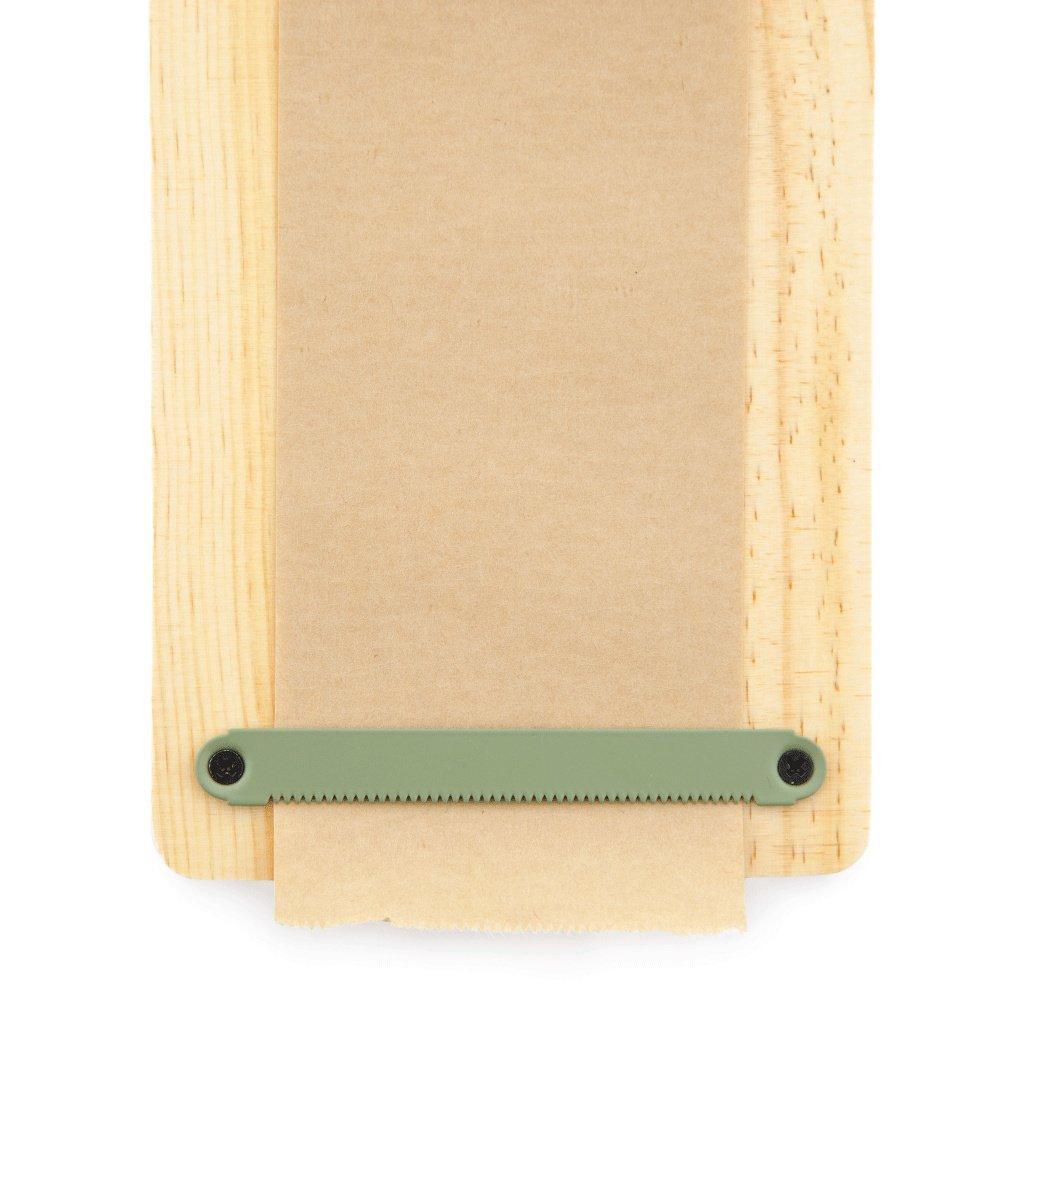 Kraft Paper Roller S - Groen-4